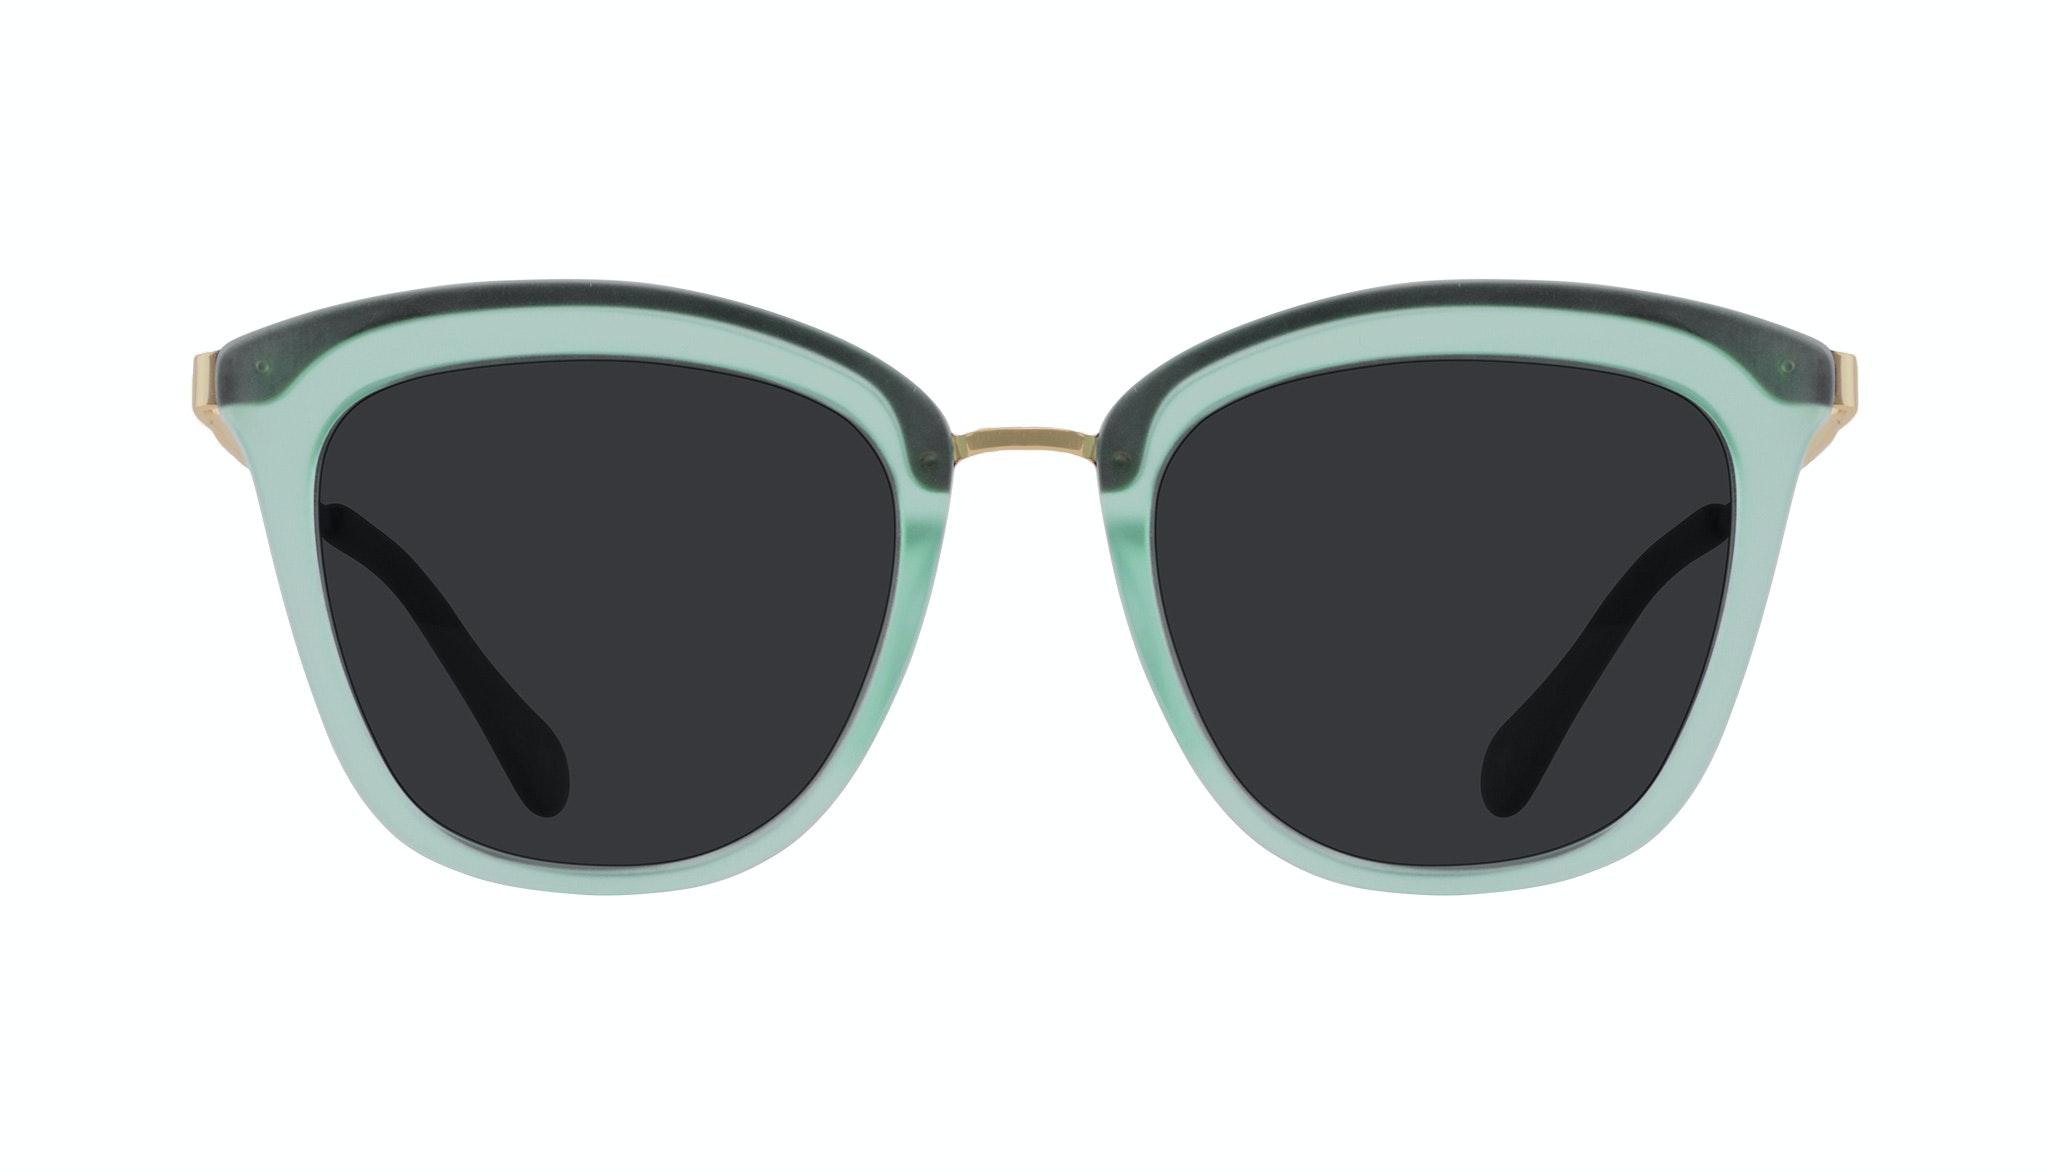 Affordable Fashion Glasses Rectangle Square Sunglasses Women More Sage